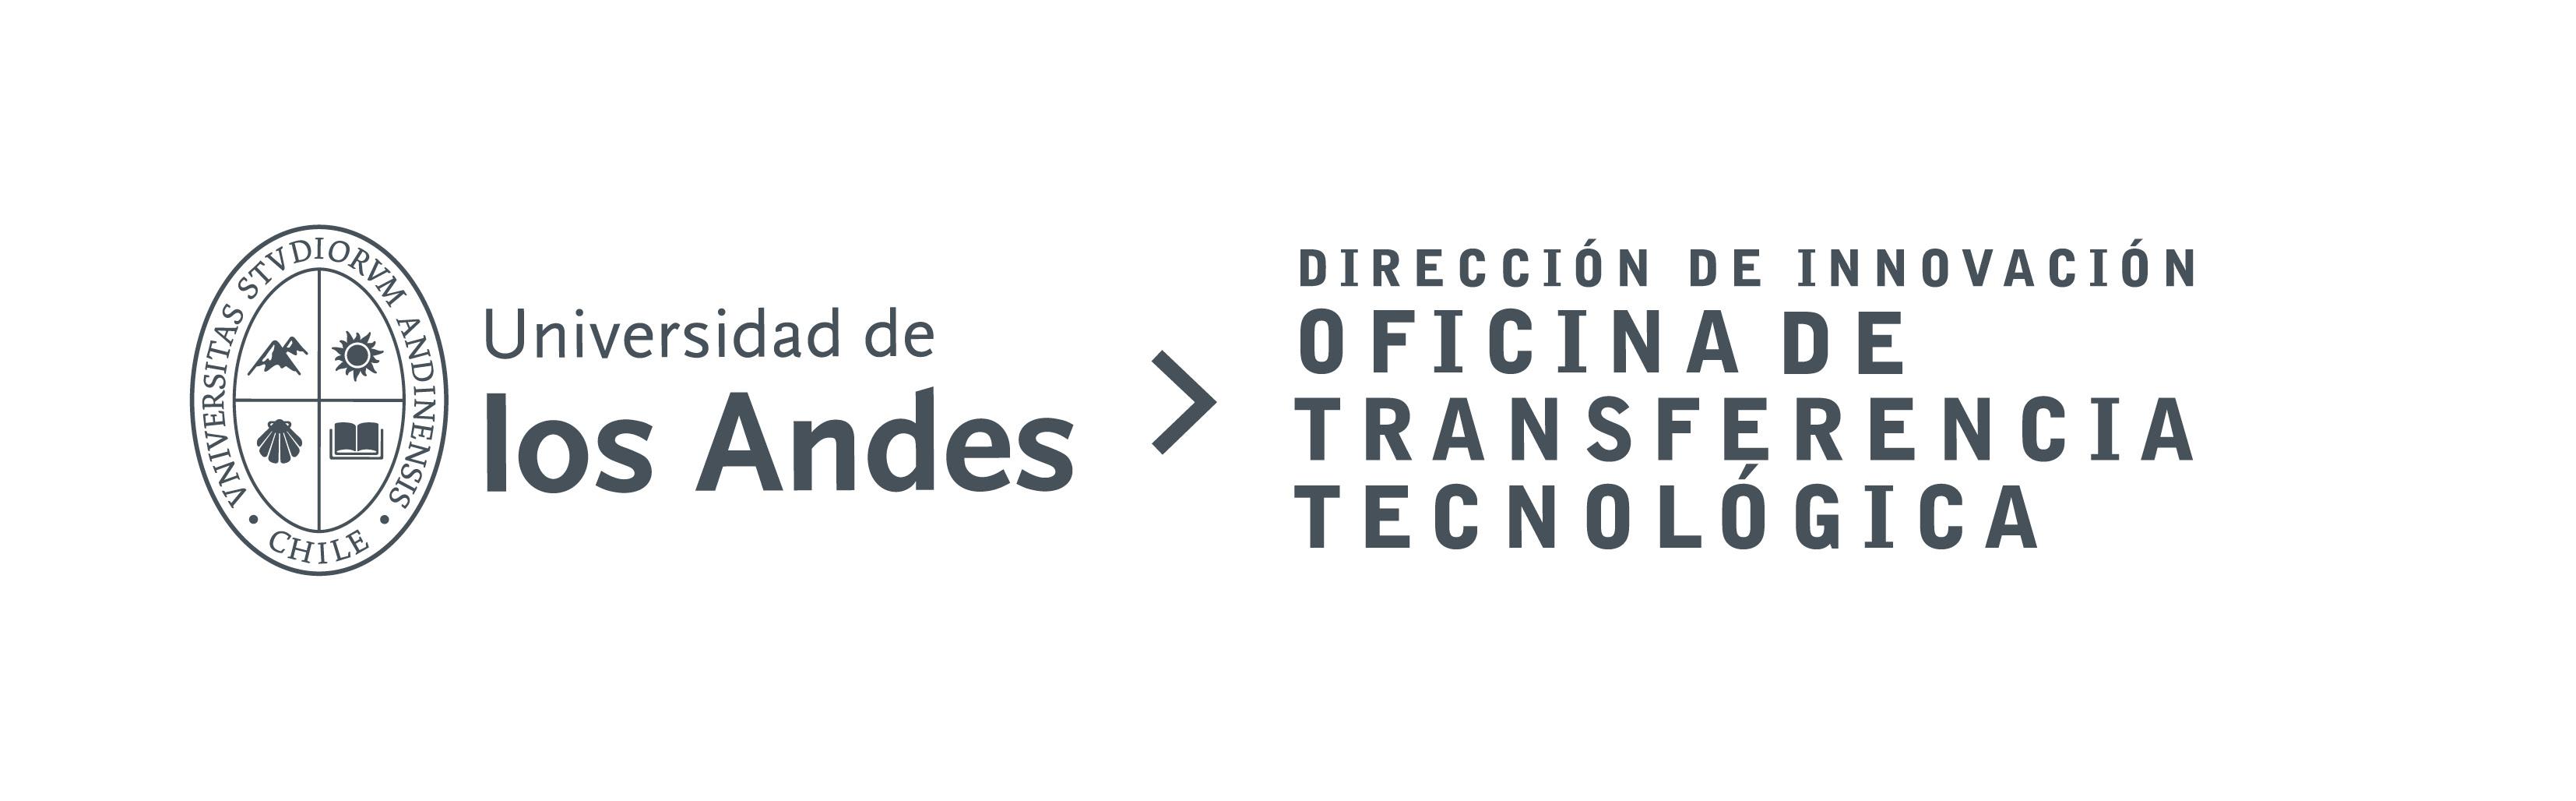 Oficina de Transferencia Tecnológica